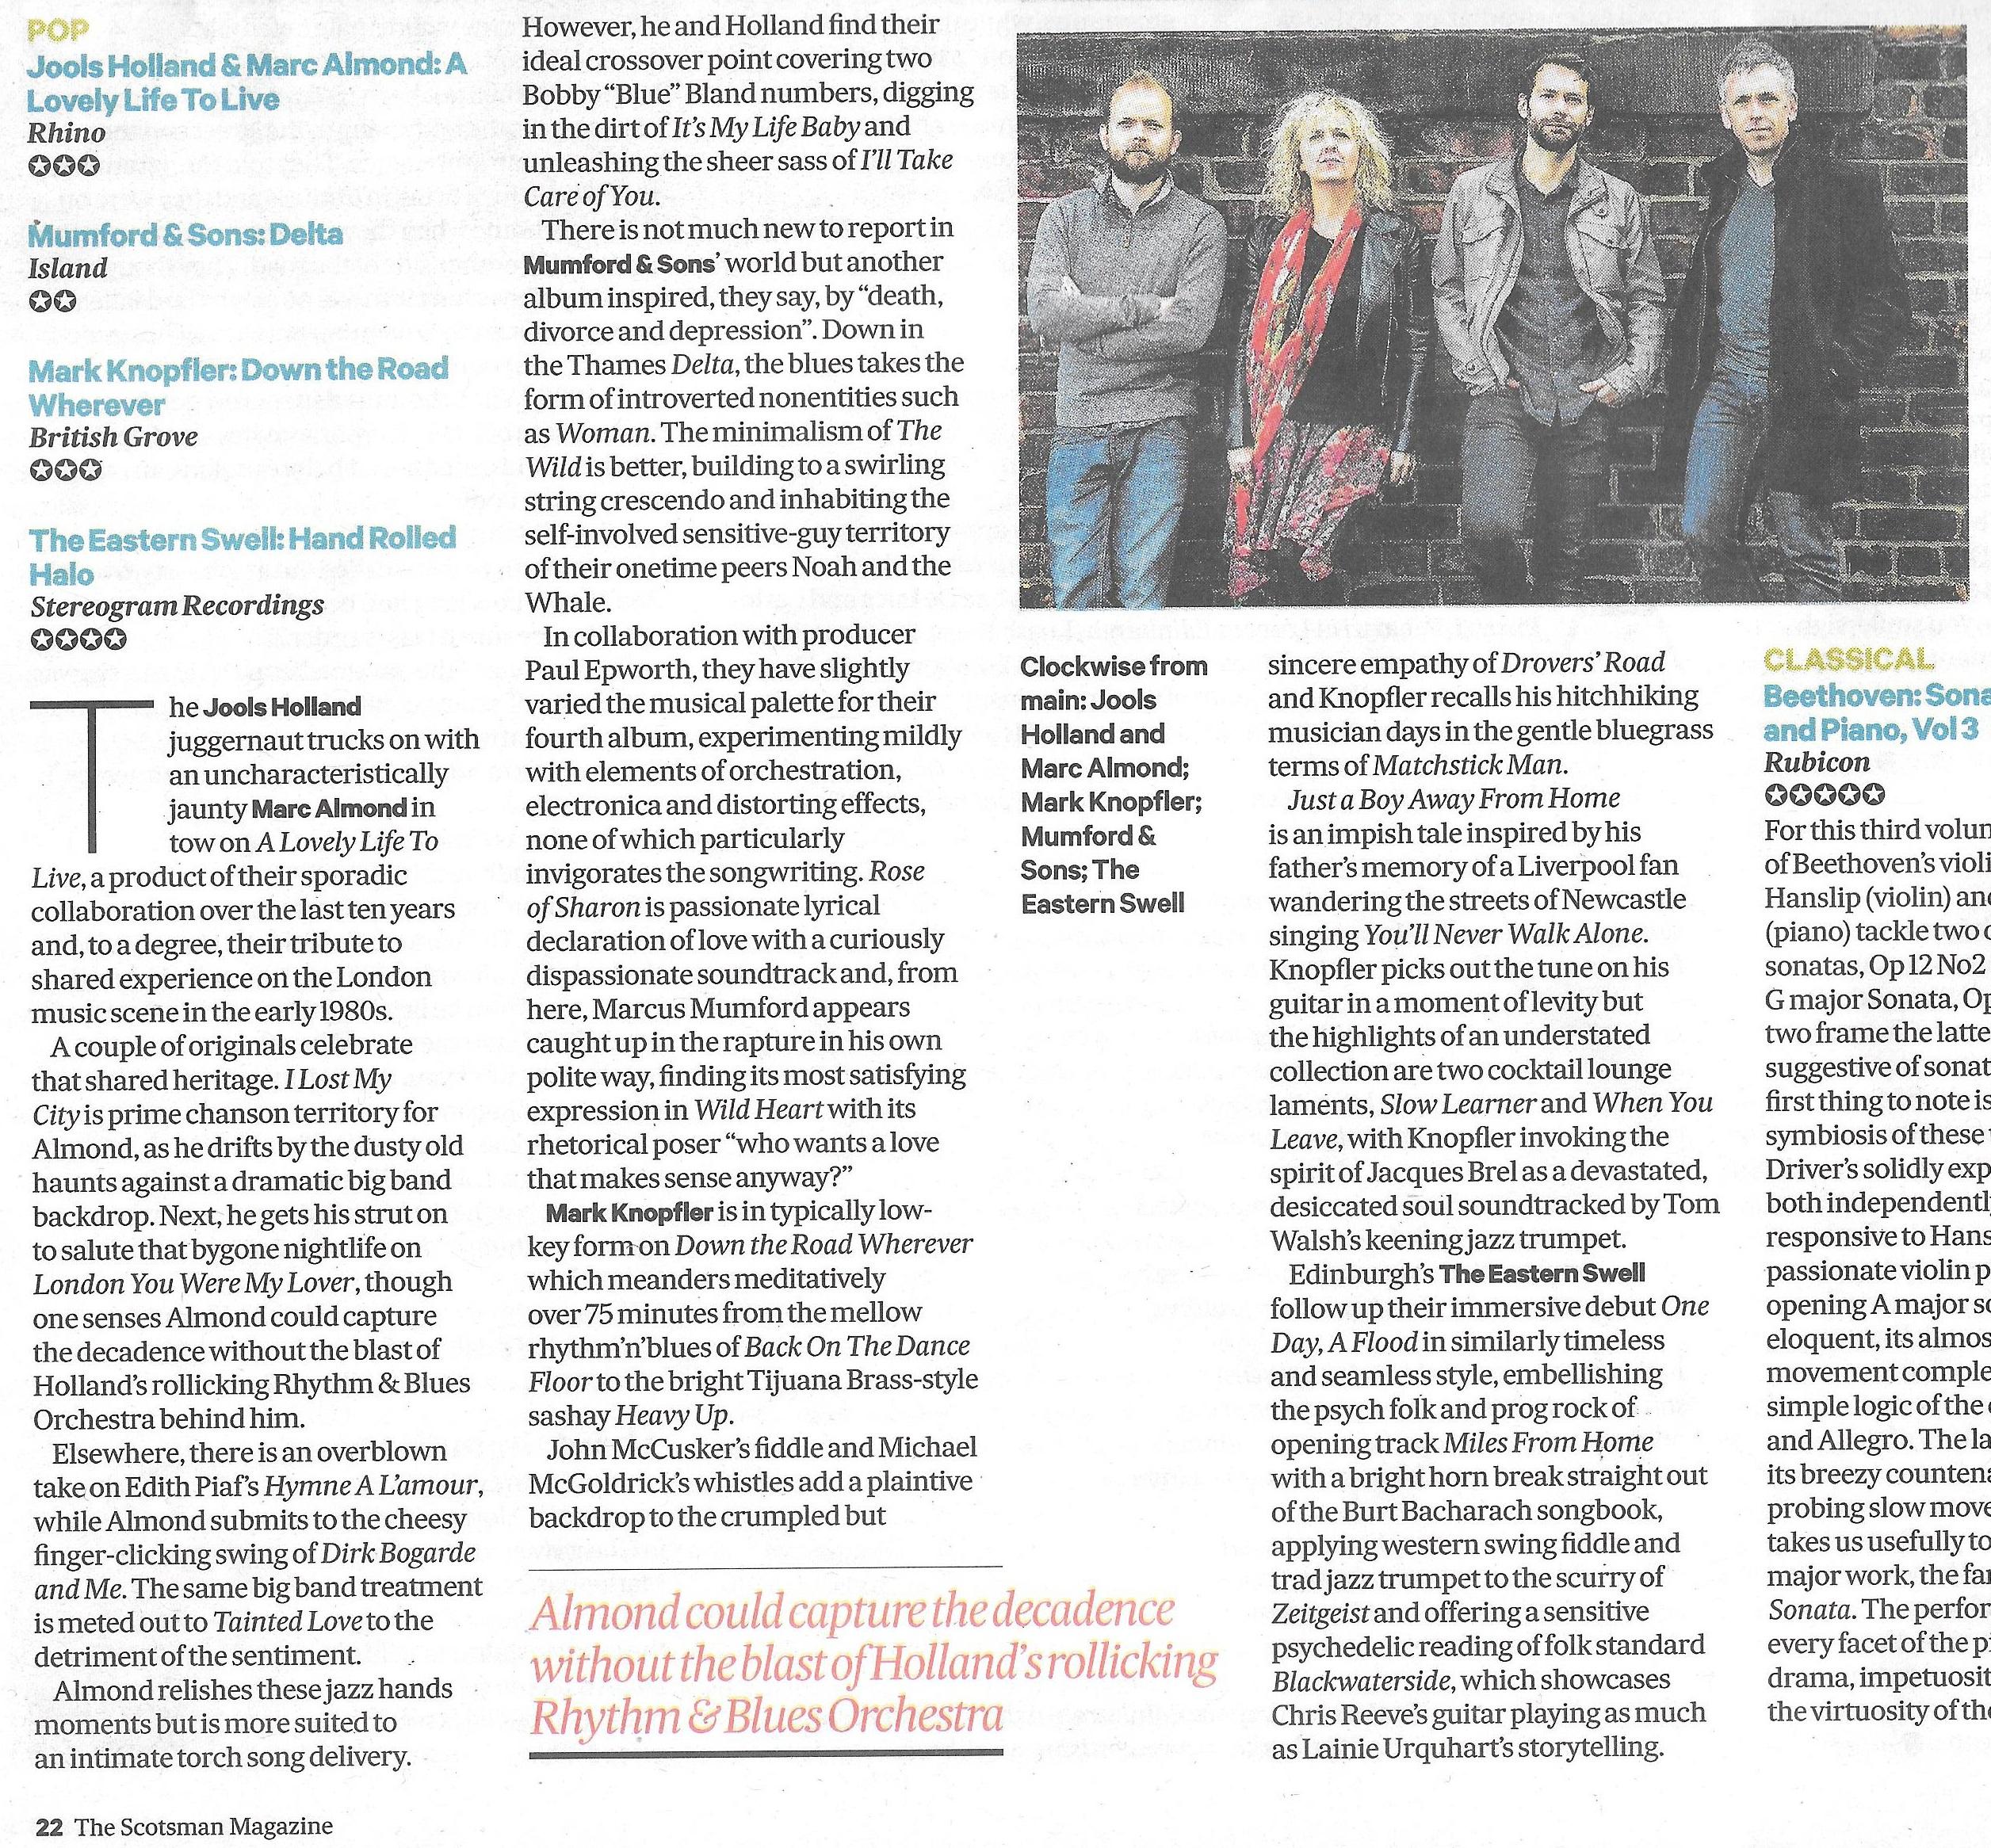 Scotsman review 24.11.18